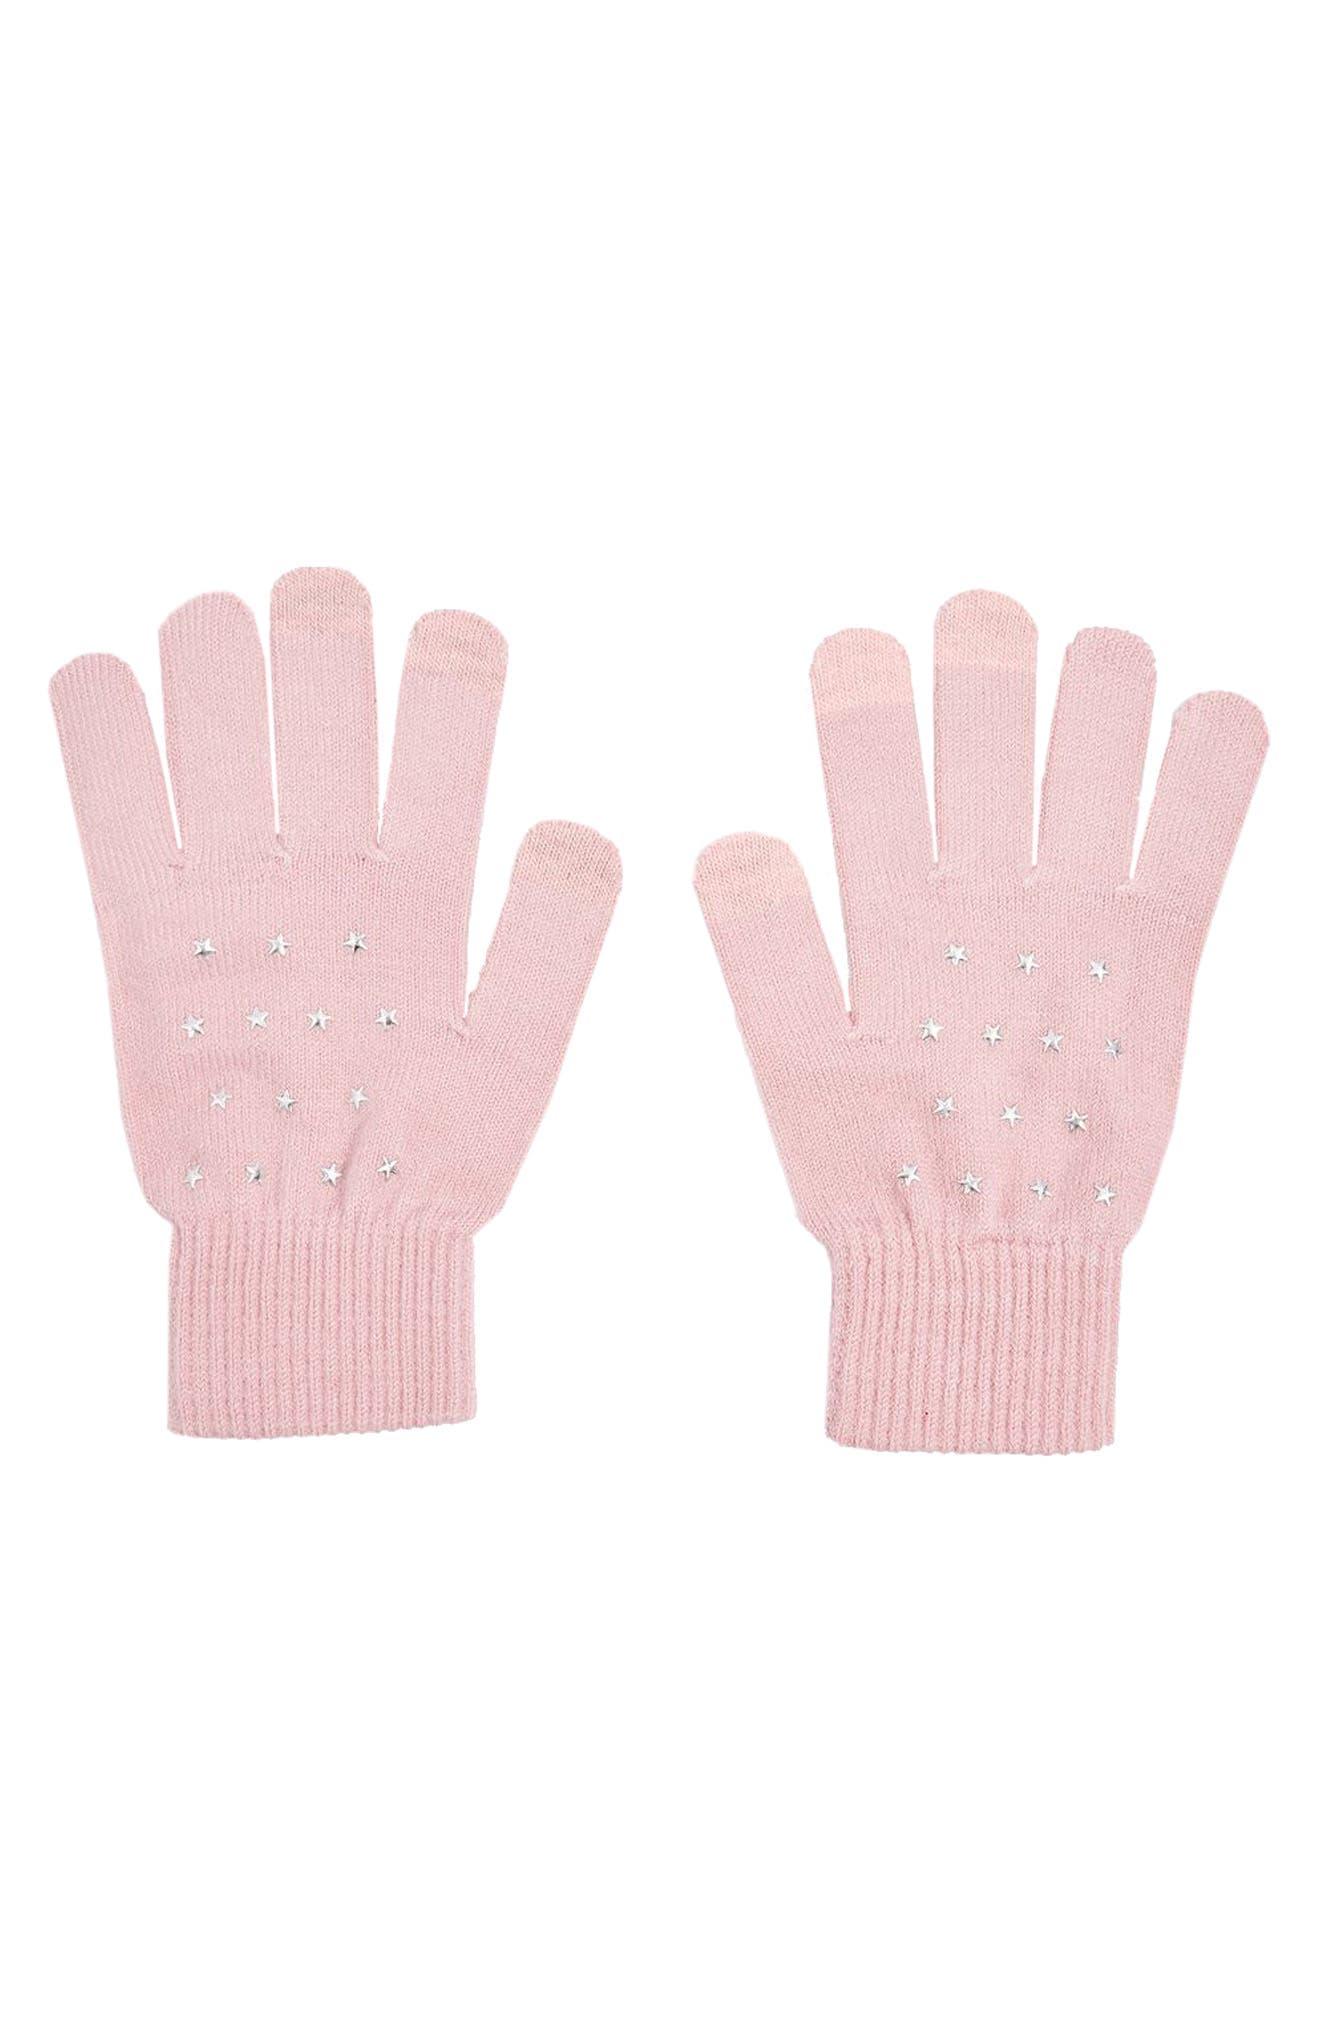 Star Knit Gloves,                         Main,                         color, Light Pink